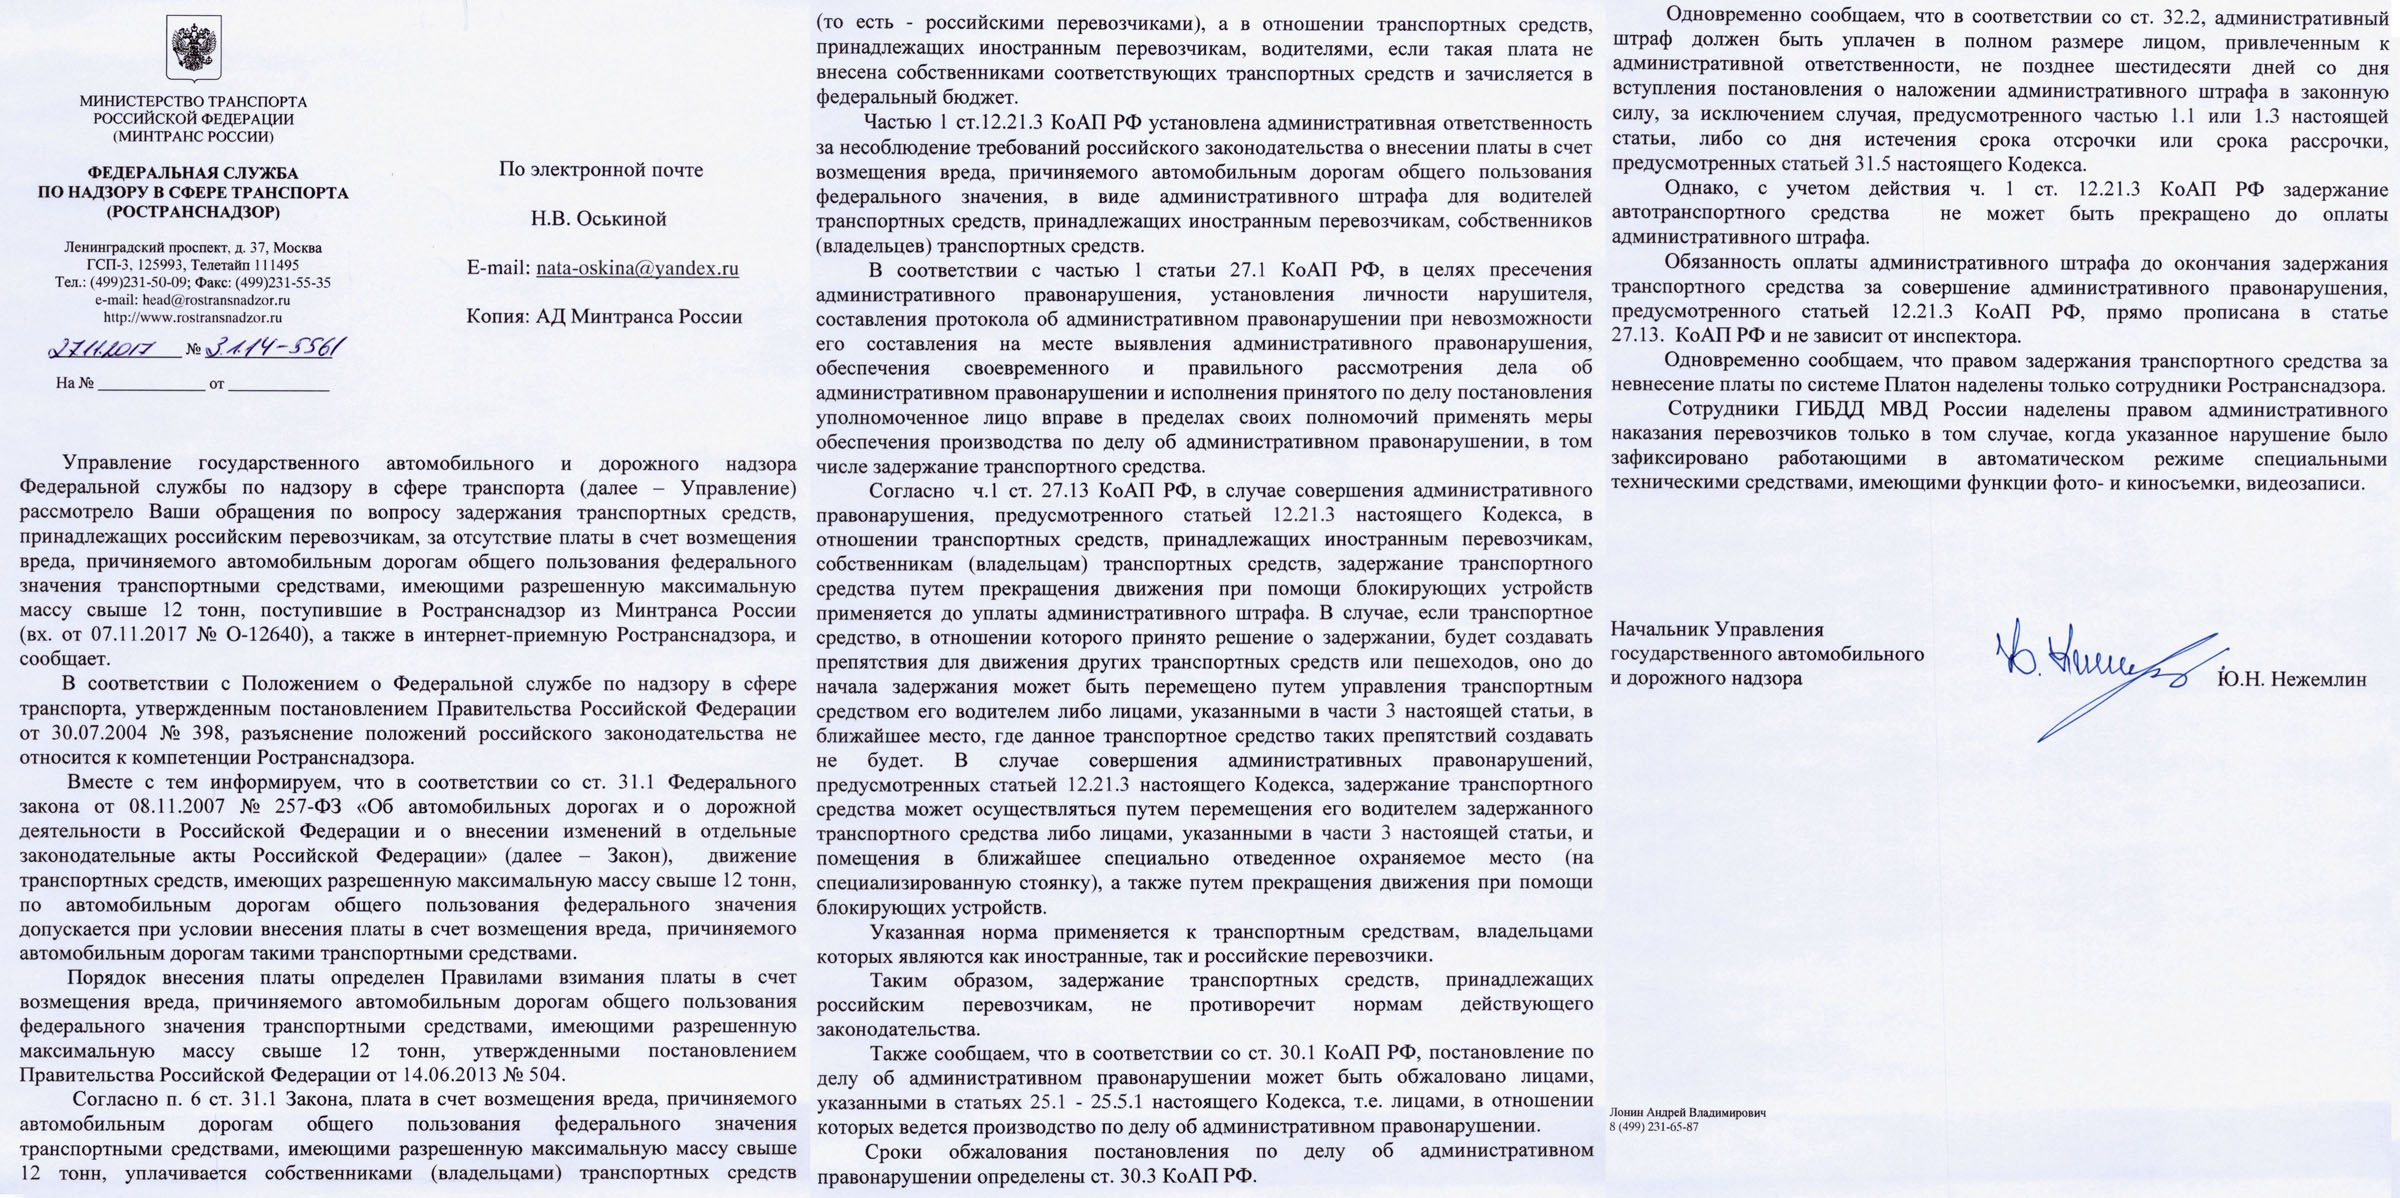 Задержание ТС ПЛАТОН на сайт.jpg